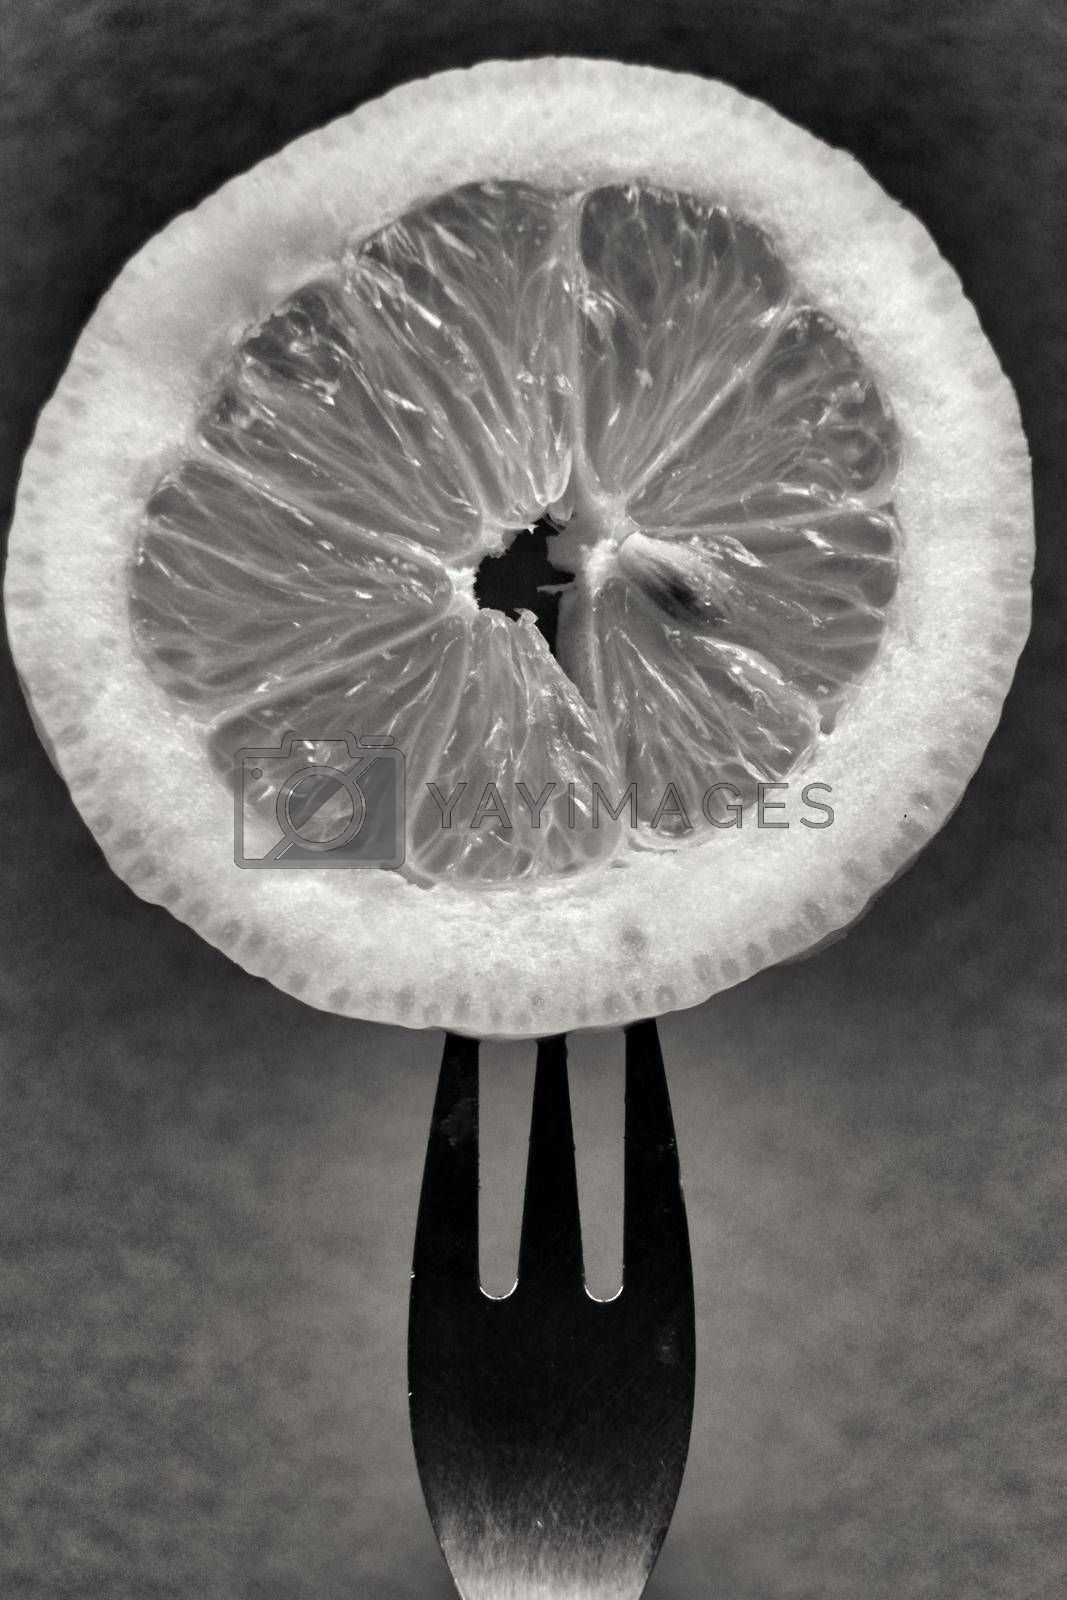 Slice of lemon pricked on fork. Monochrome photography.